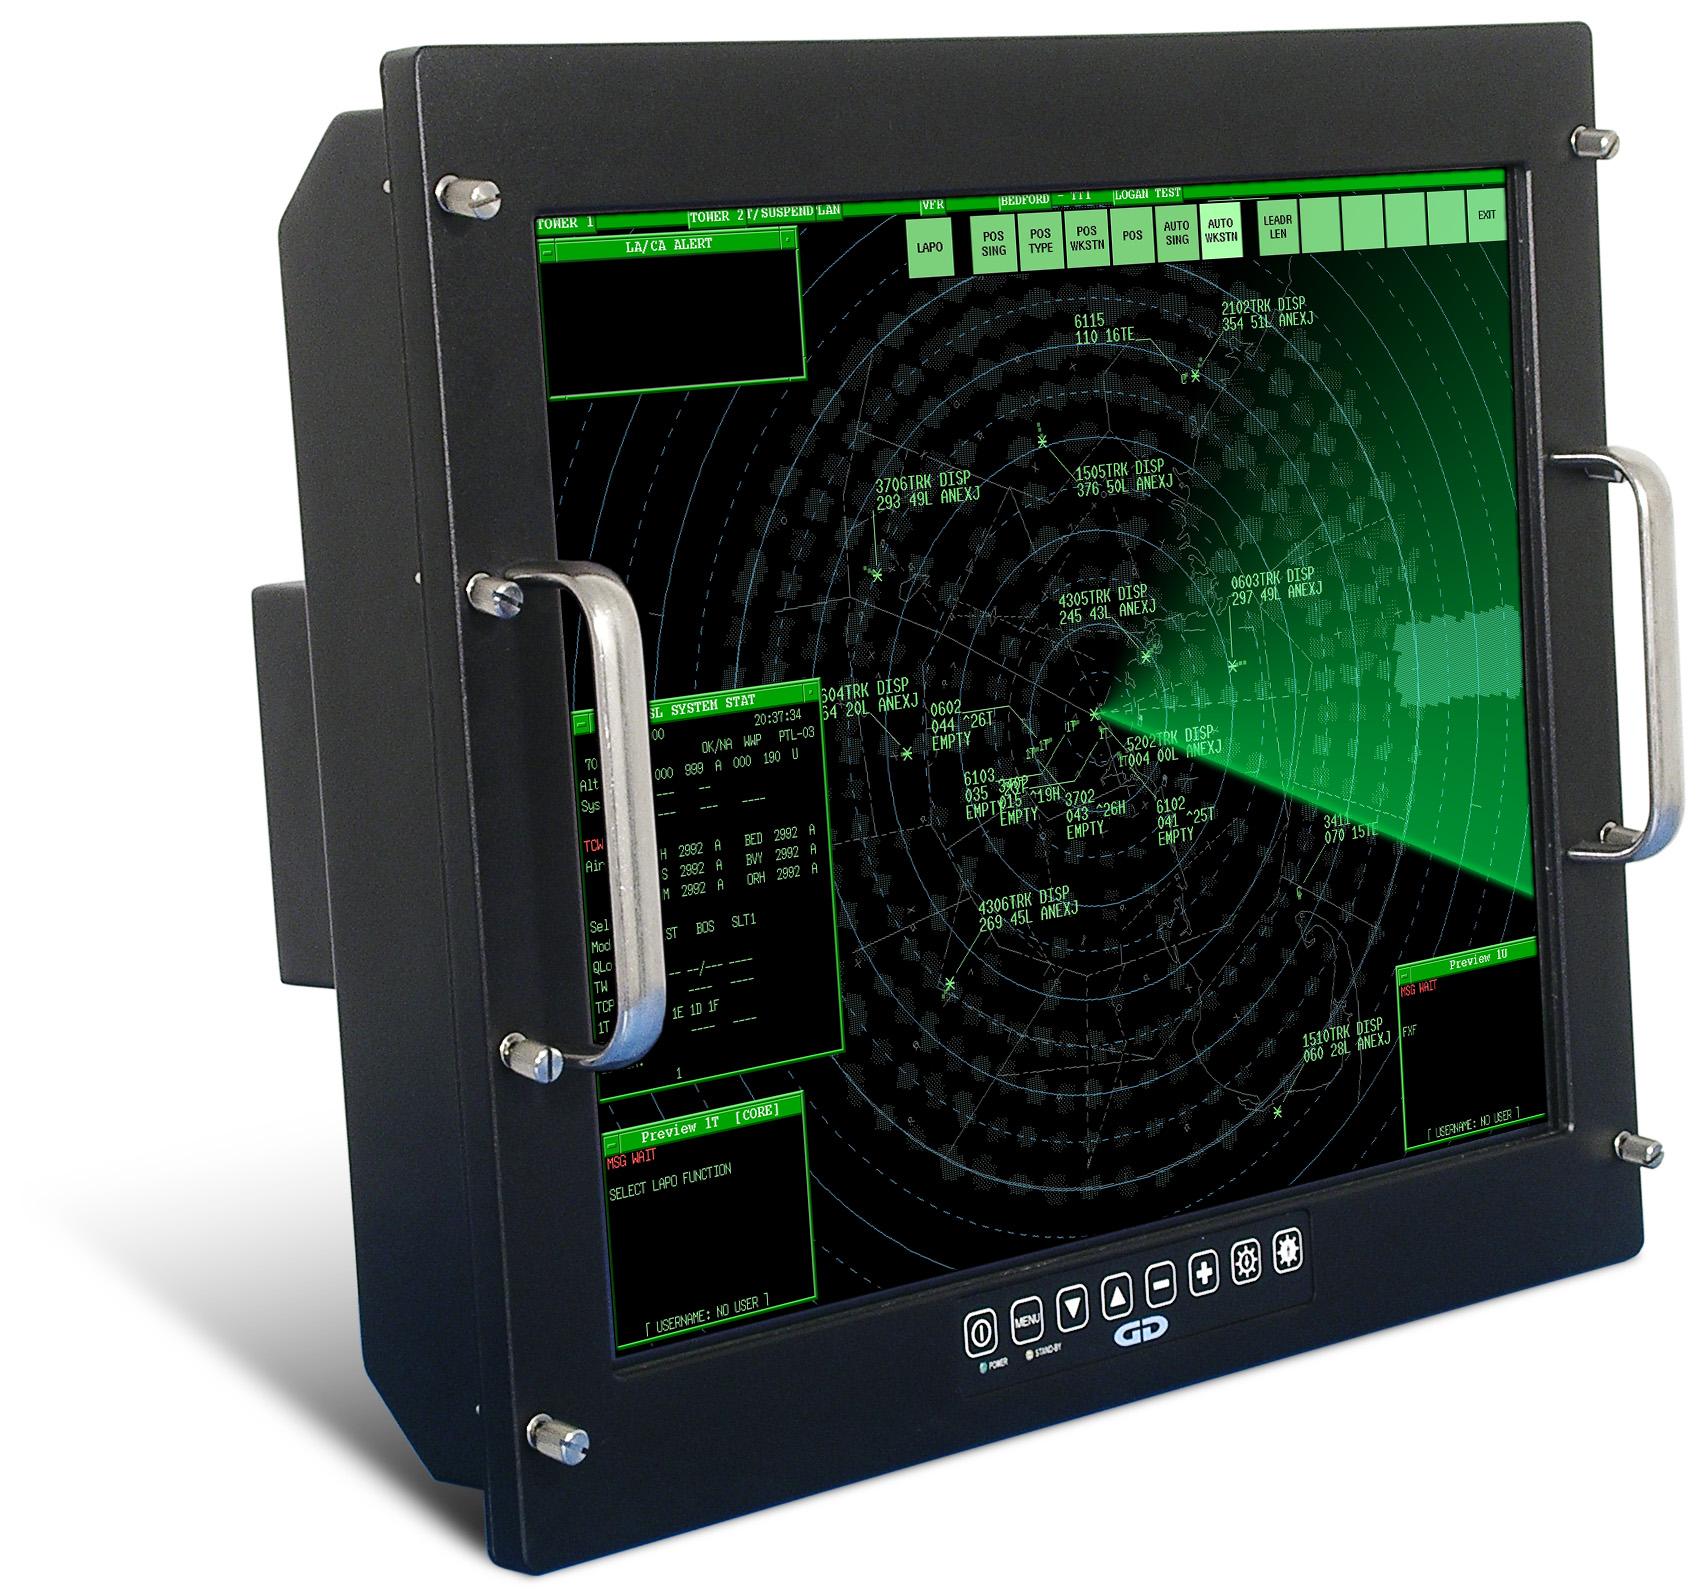 Saber RackMount Solar NVIS military-grade high bright monitor